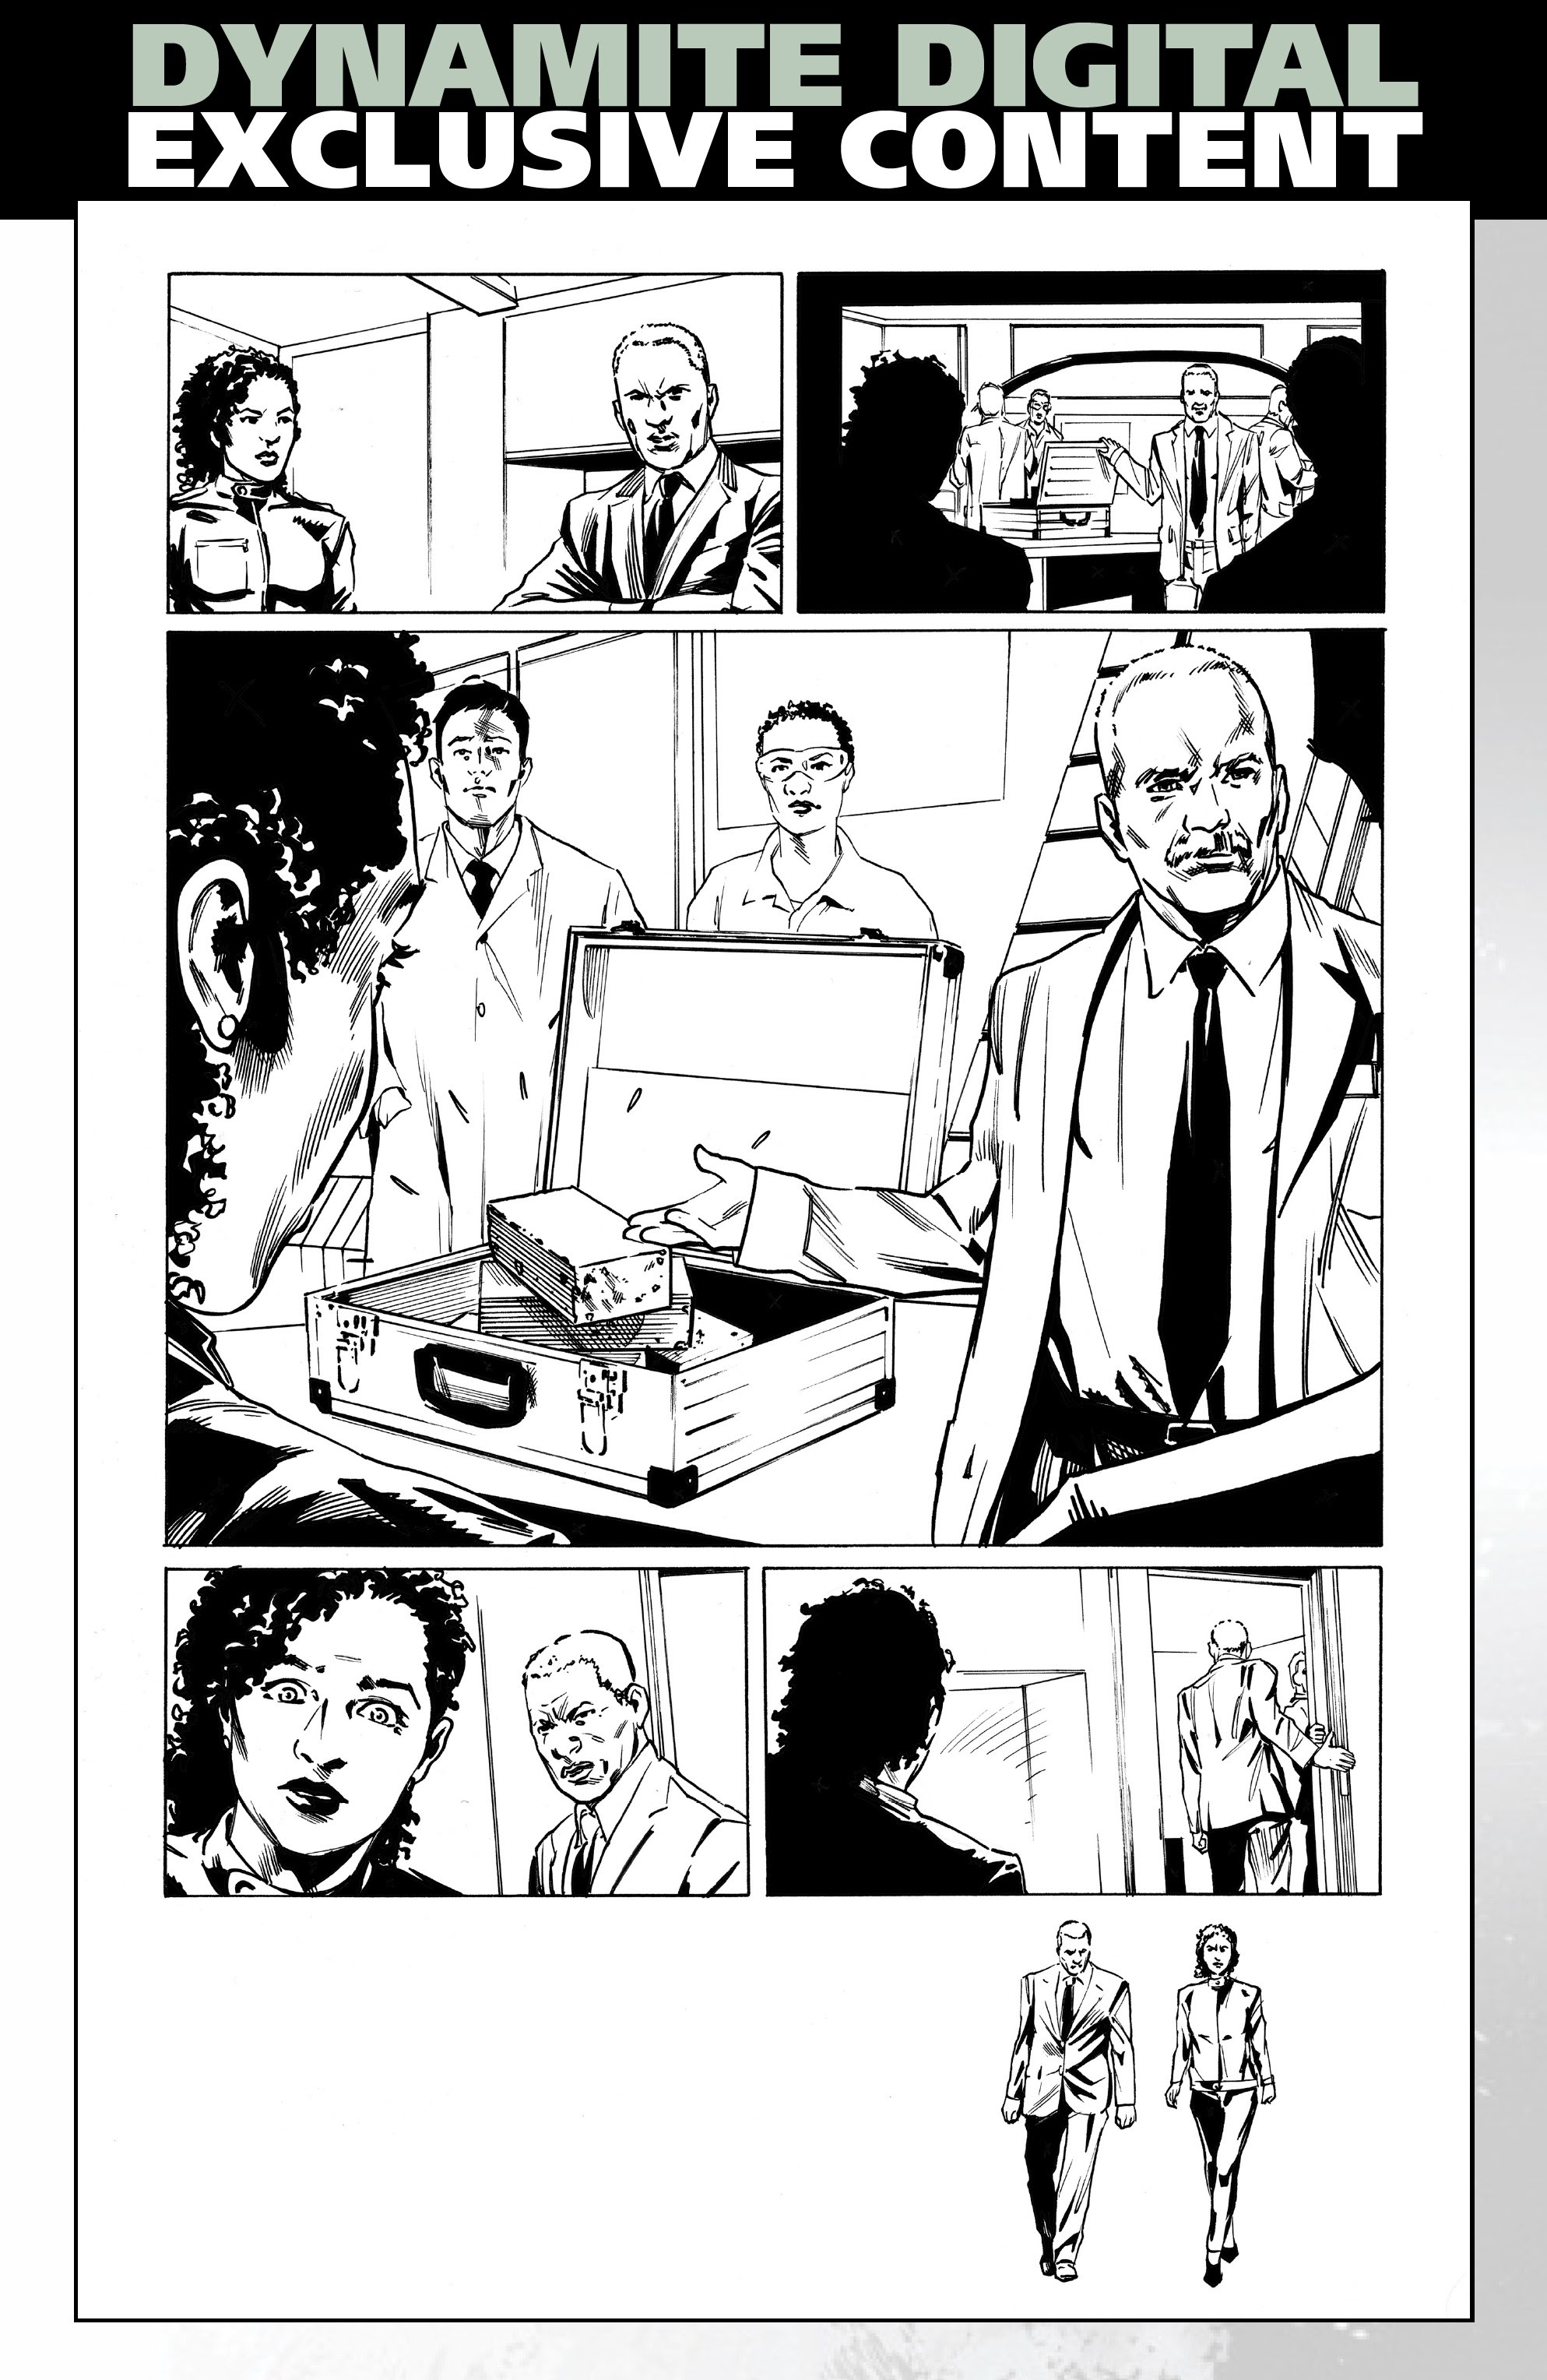 James Bond 007 5 Read James Bond 007 Issue 5 Page 29